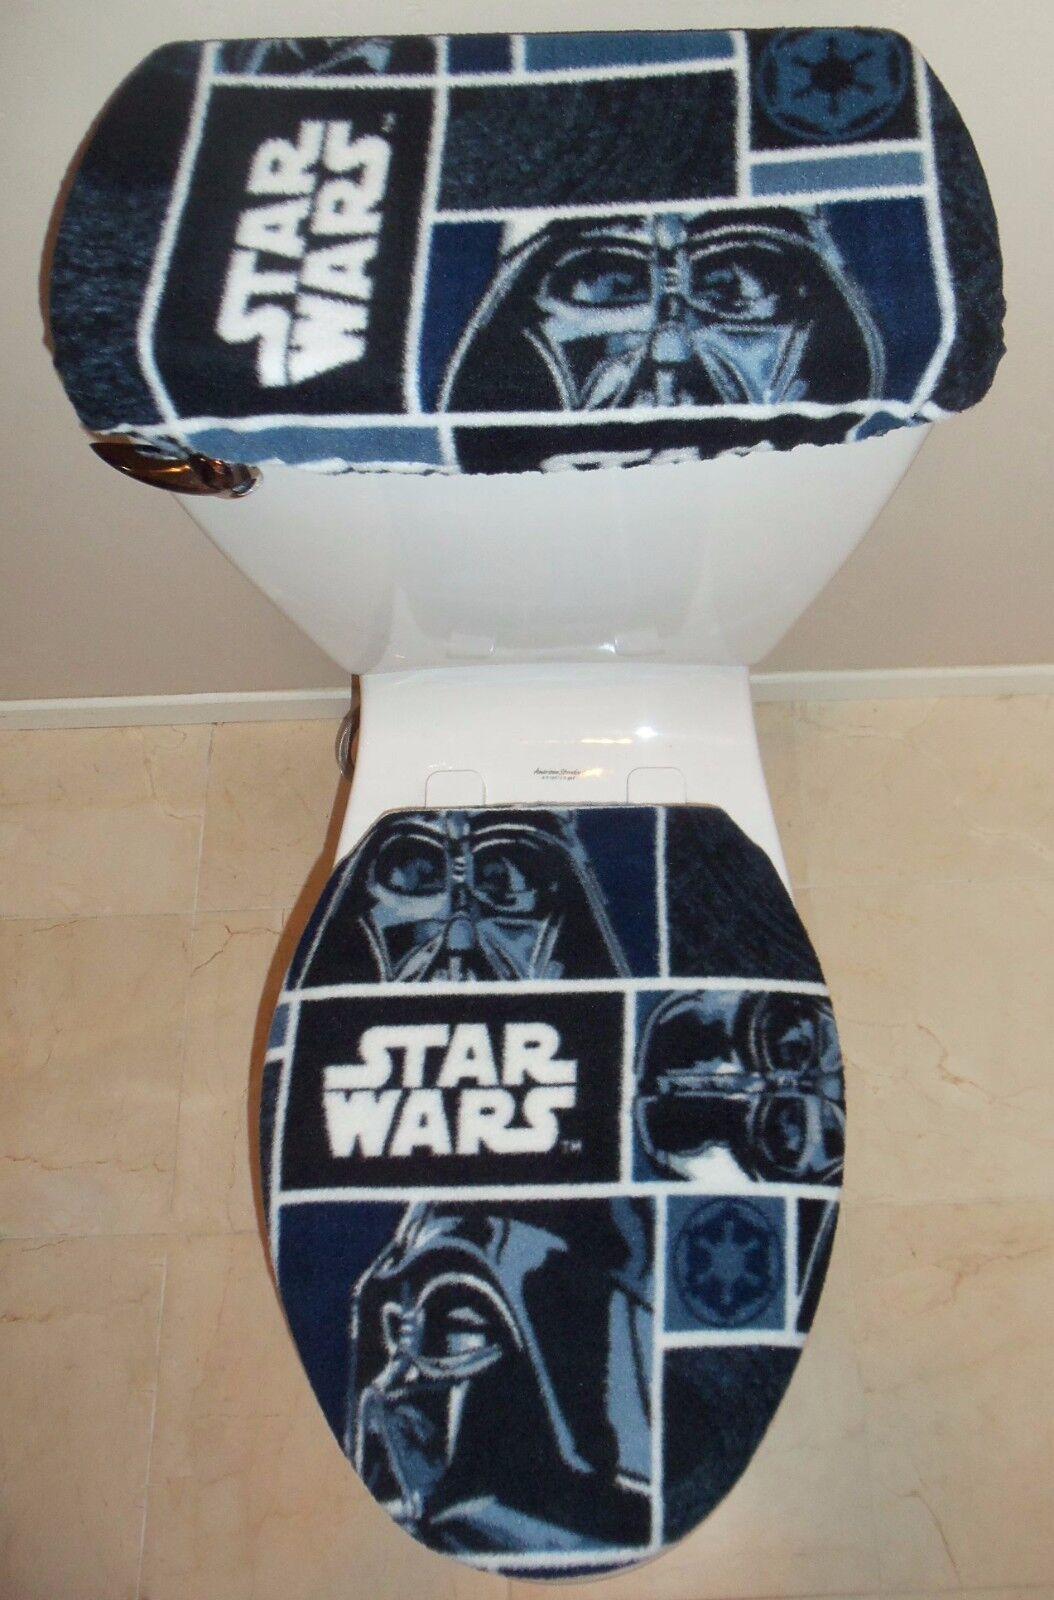 Star Wars Darth Vader Fleece Fabric Toilet Seat Cover Set Bathroom .